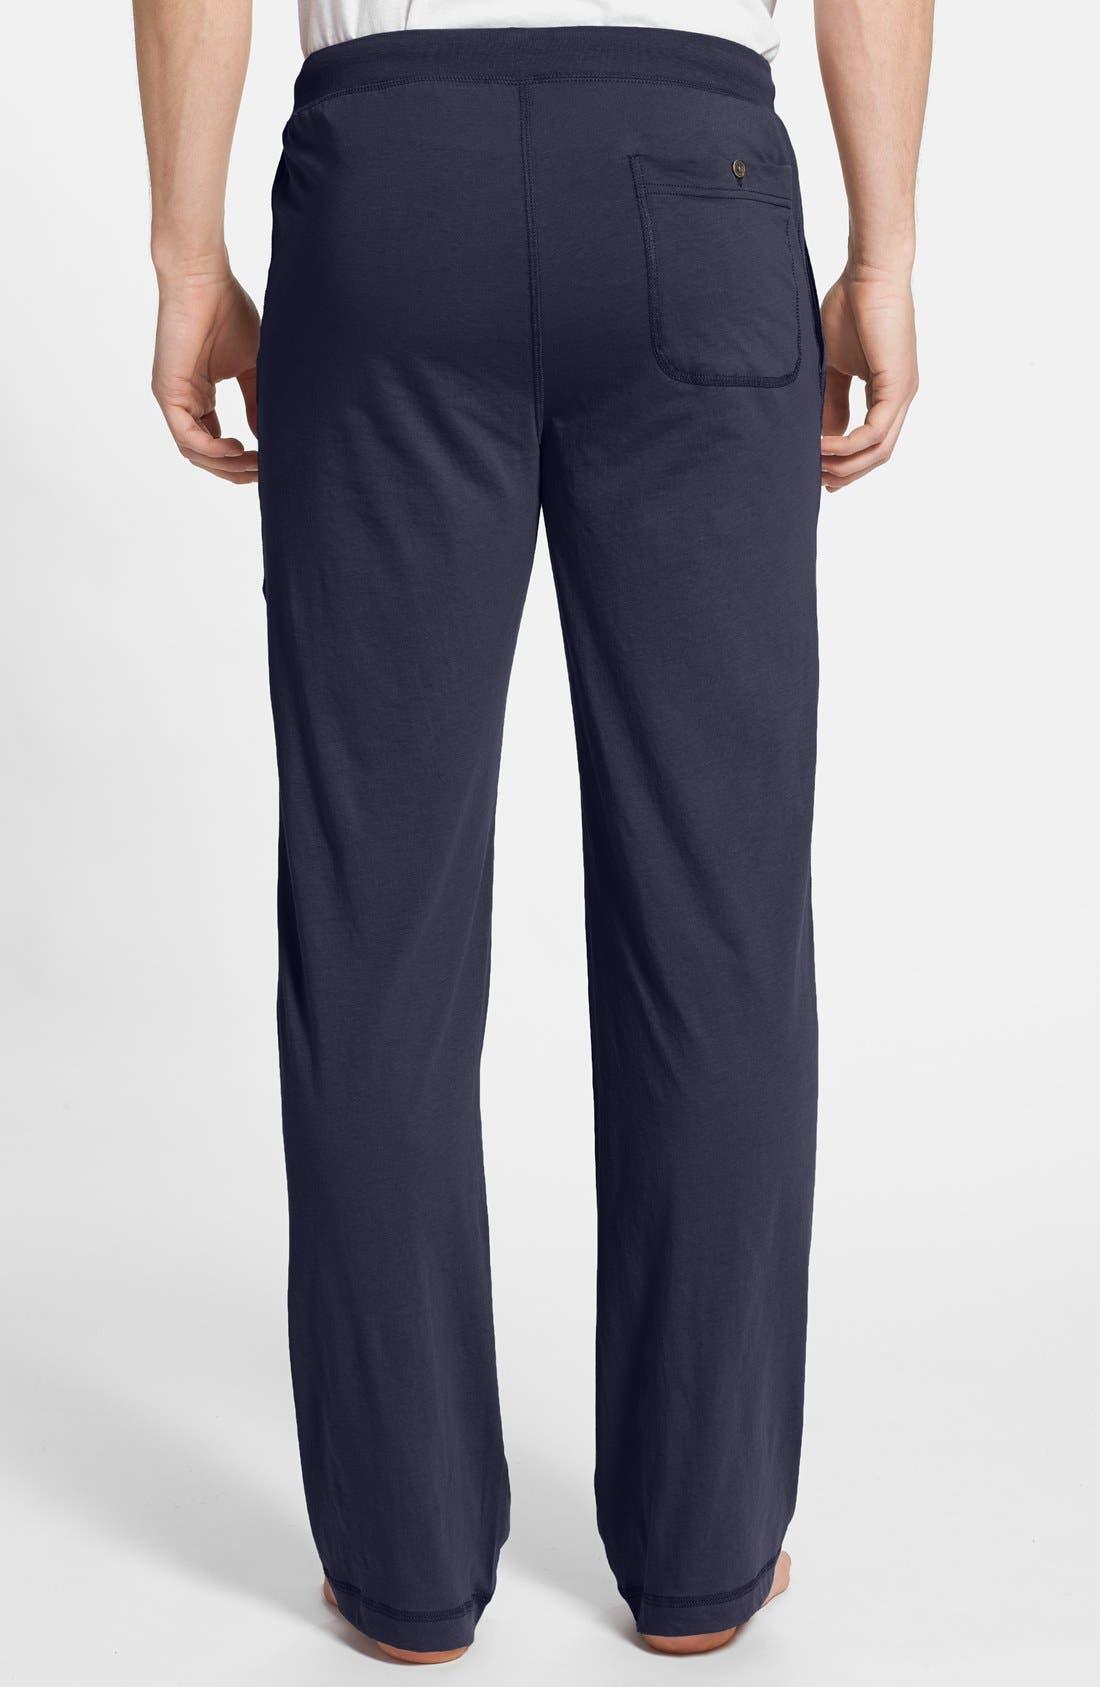 Peruvian Pima Lightweight Cotton Lounge Pants,                             Alternate thumbnail 2, color,                             NAVY